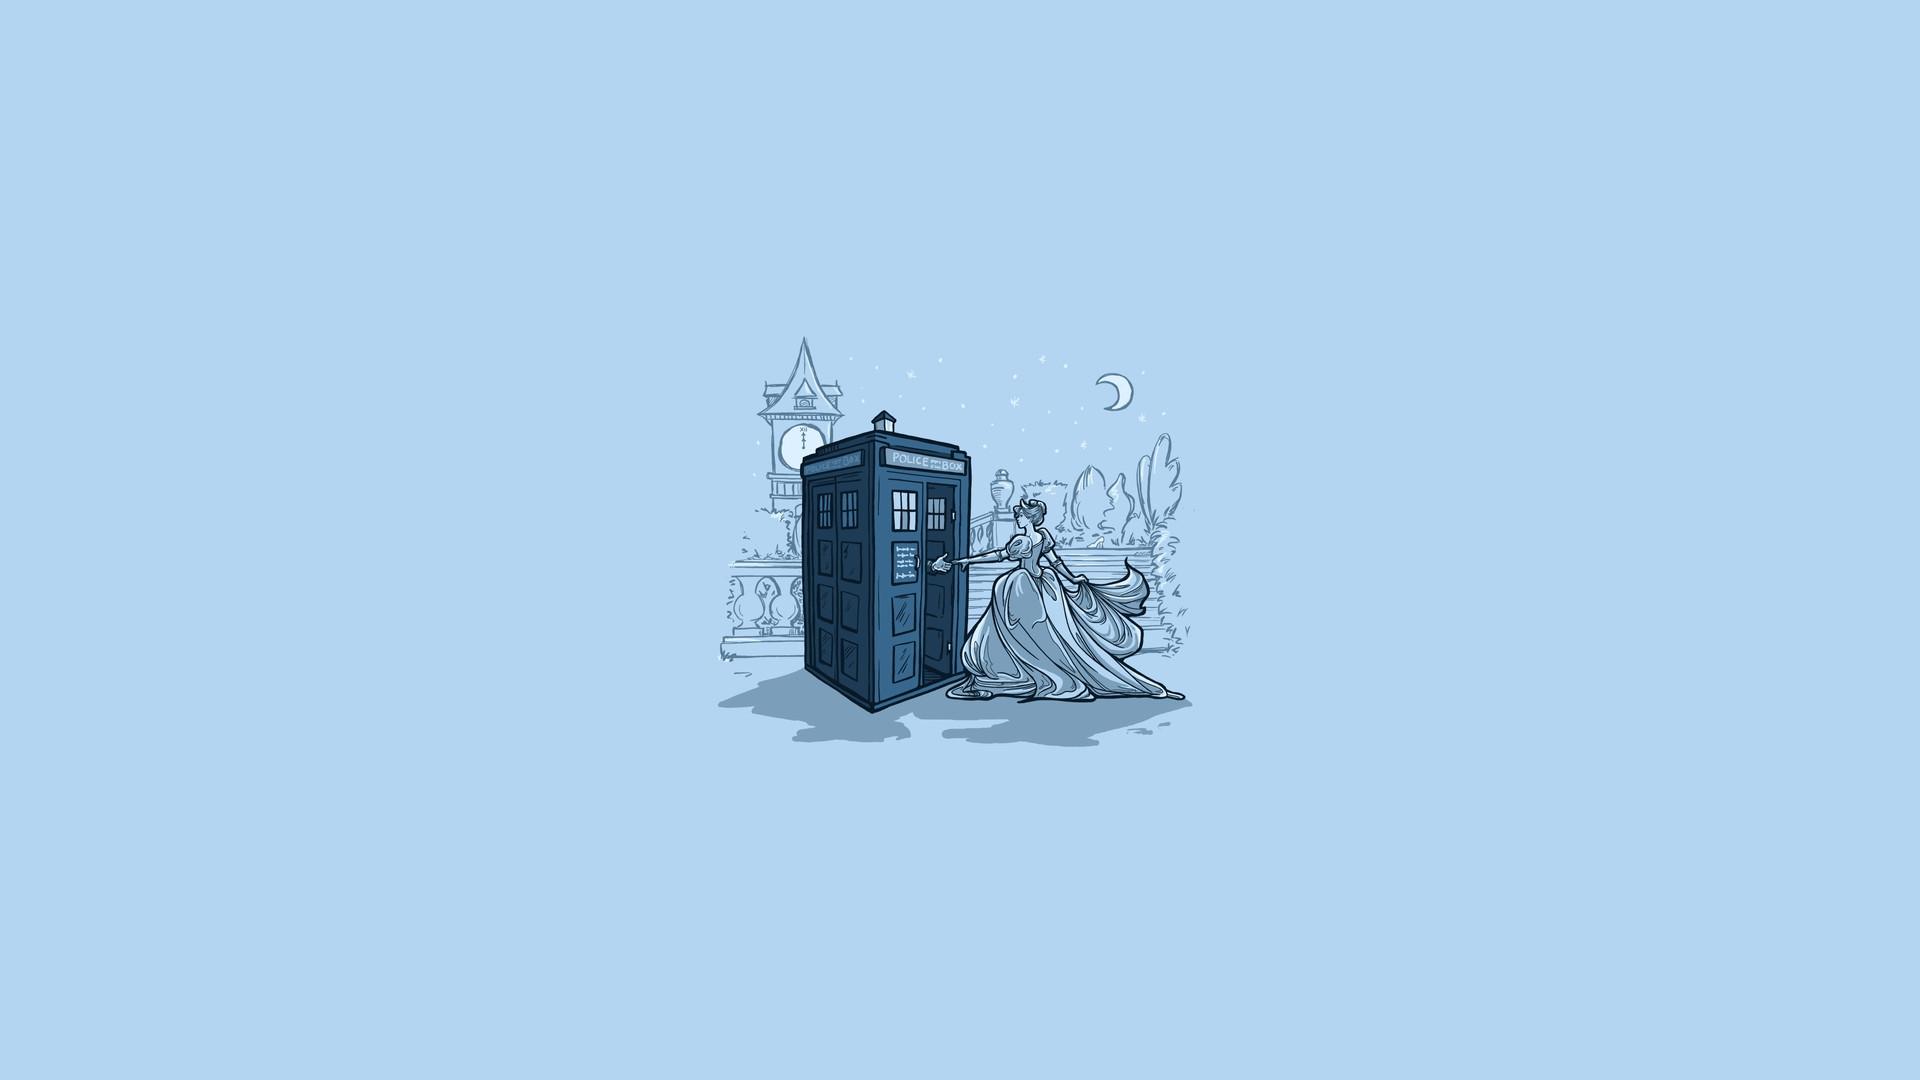 Res: 1920x1080, TARDIS Disney crossover Wallpaper #9376